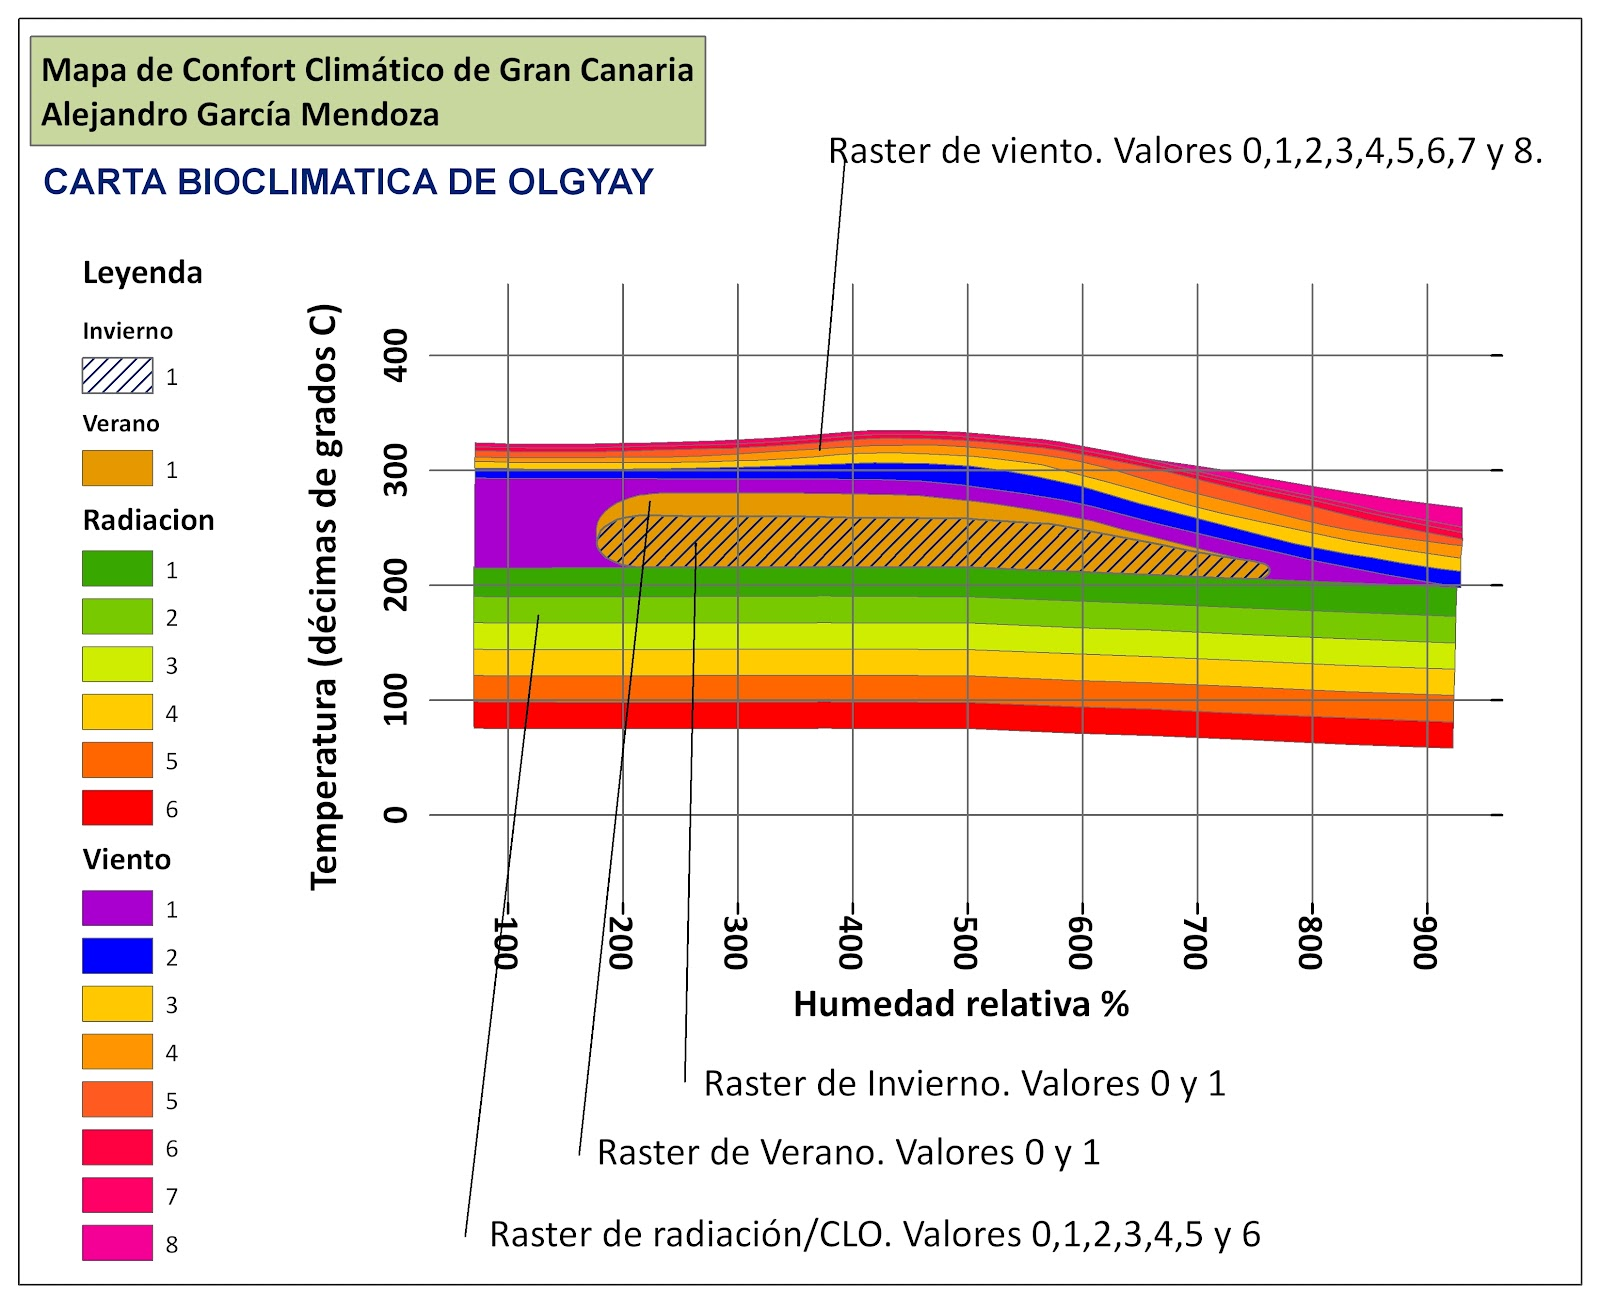 Mapa de confort clim tico de gran canaria digitalizaci n - Humedad relativa espana ...